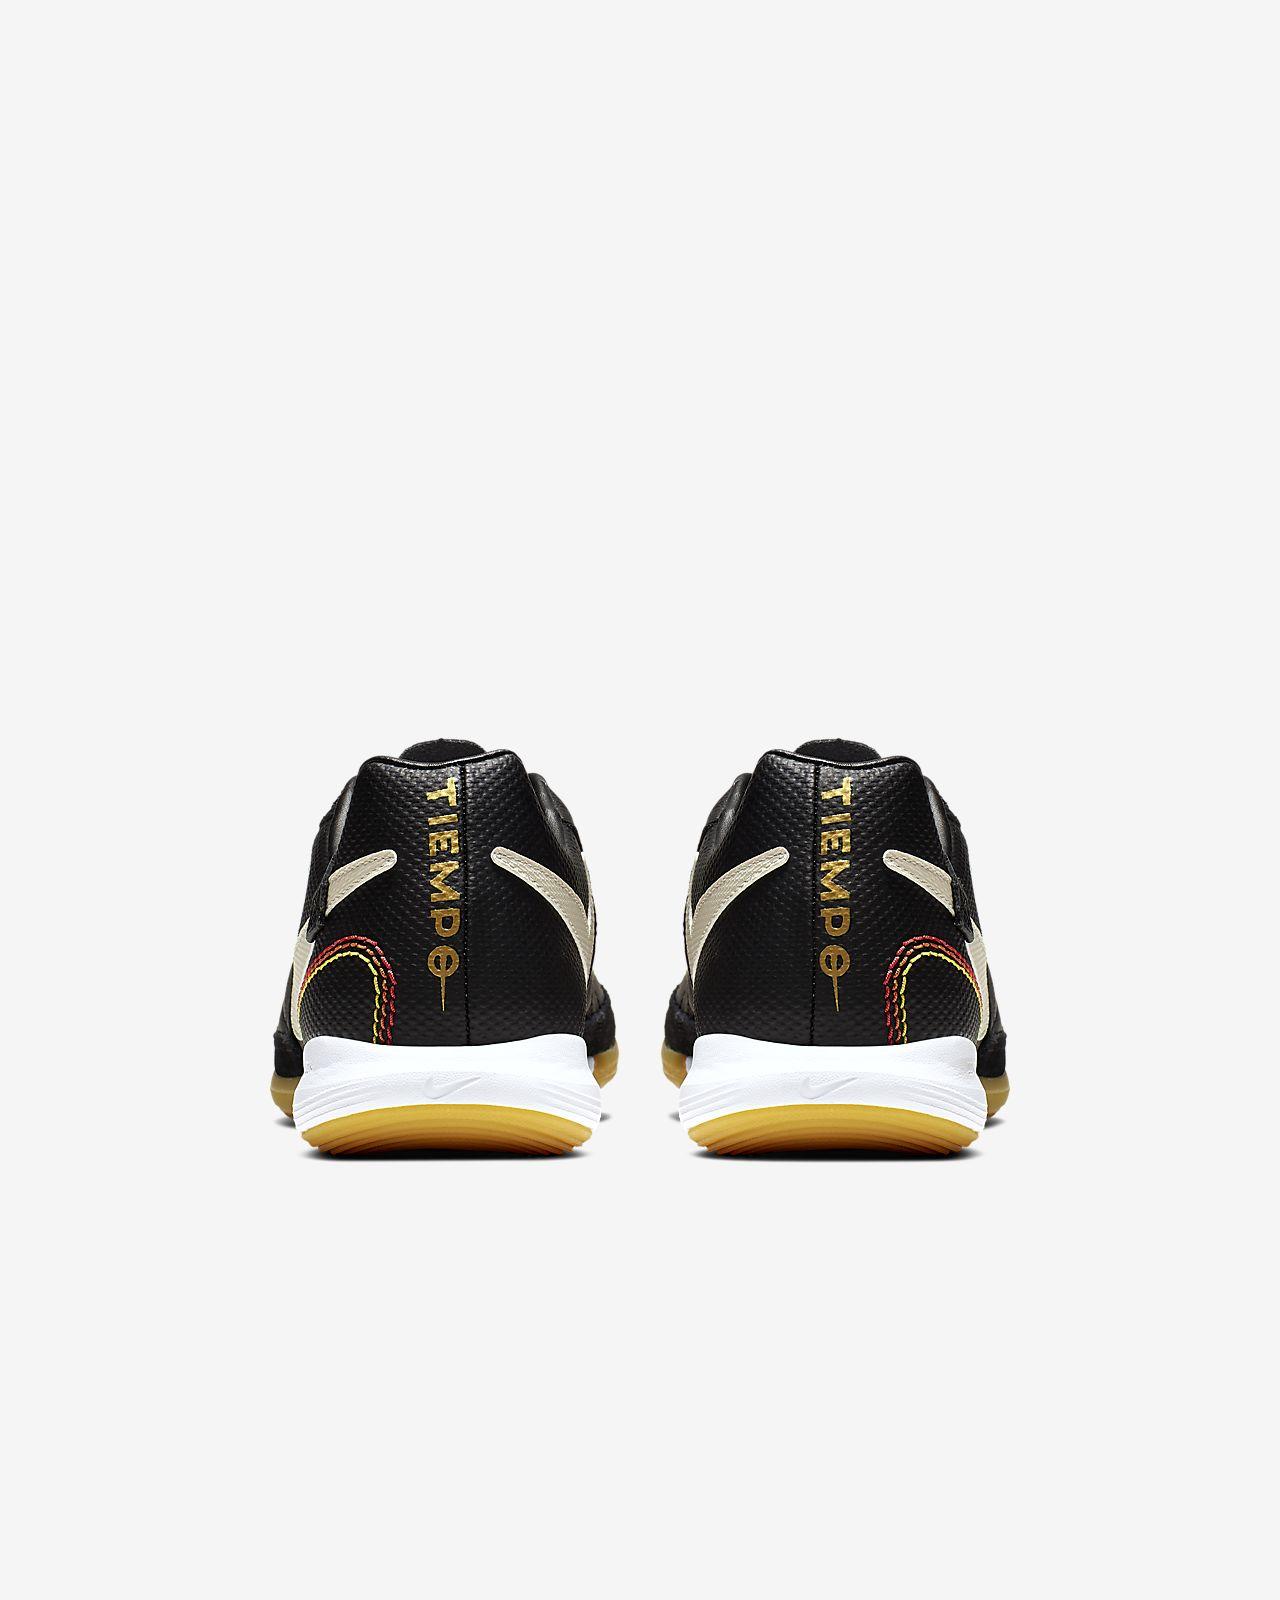 wholesale dealer 949b4 22903 ... Nike TiempoX Lunar Legend VII Pro 10R Indoor Court Football Shoe